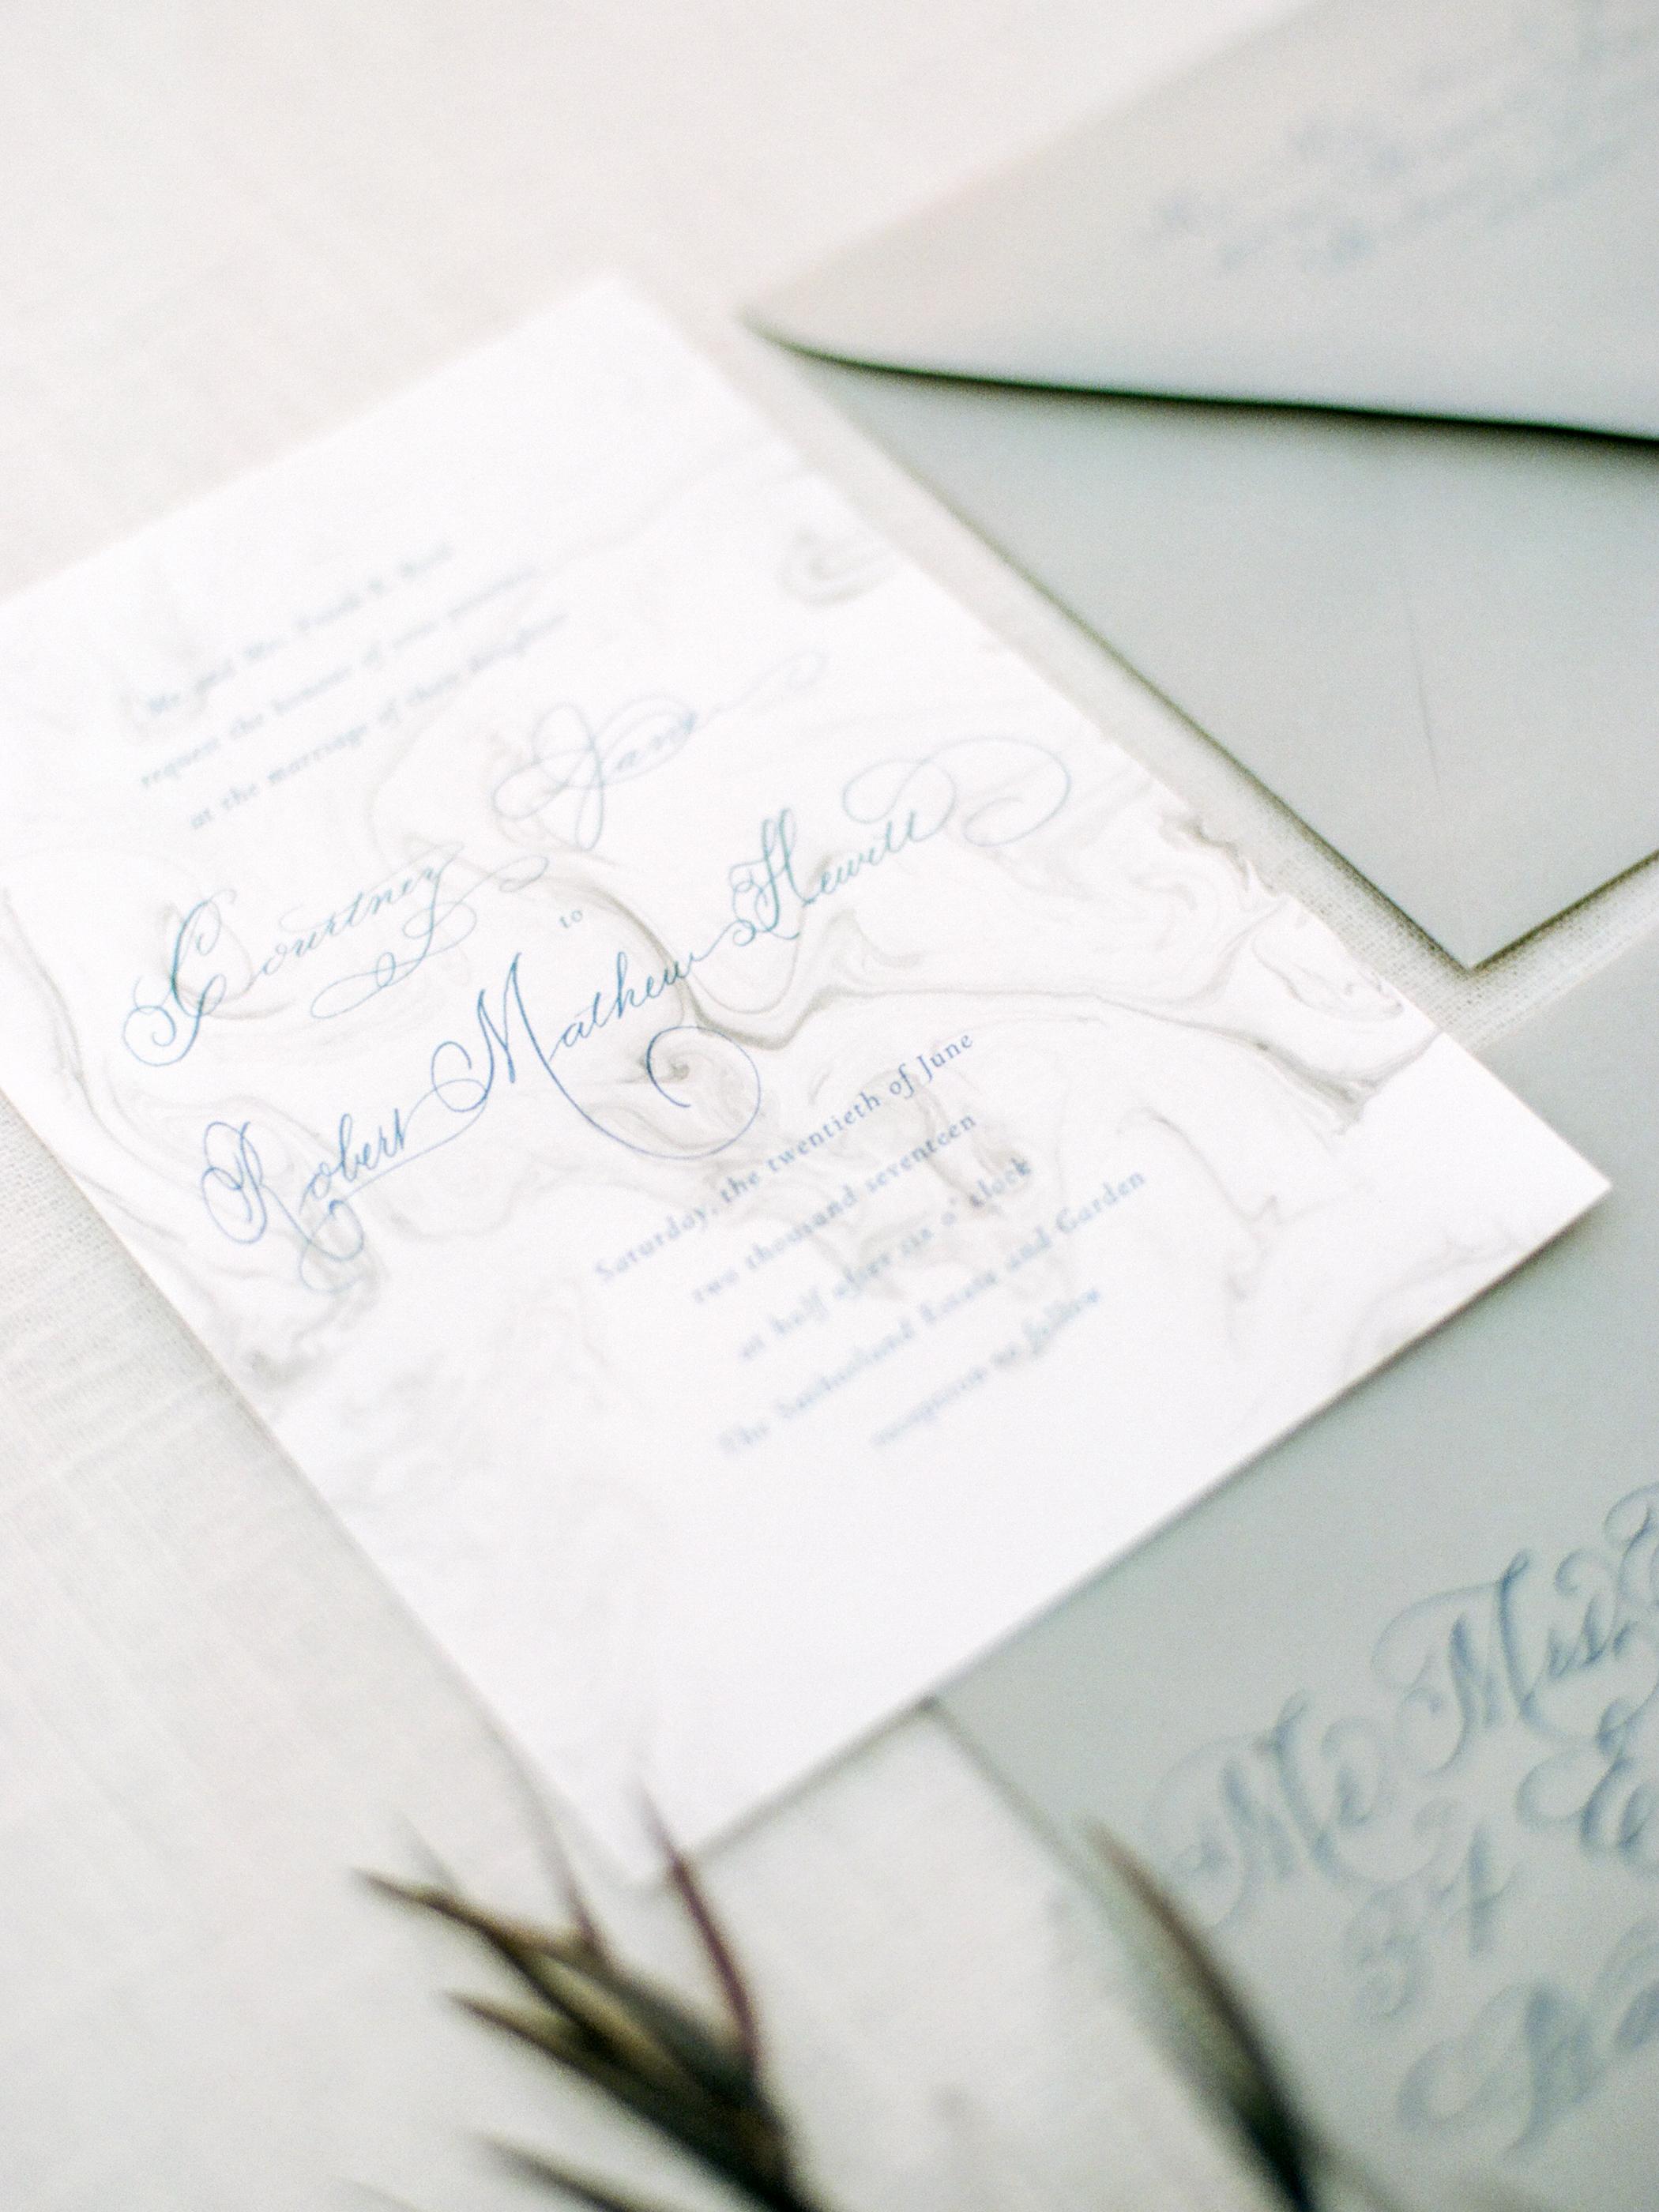 Laurel Calligraphy Live View Studio Gilded Bridal Modern Romantic Shoot (6).jpg